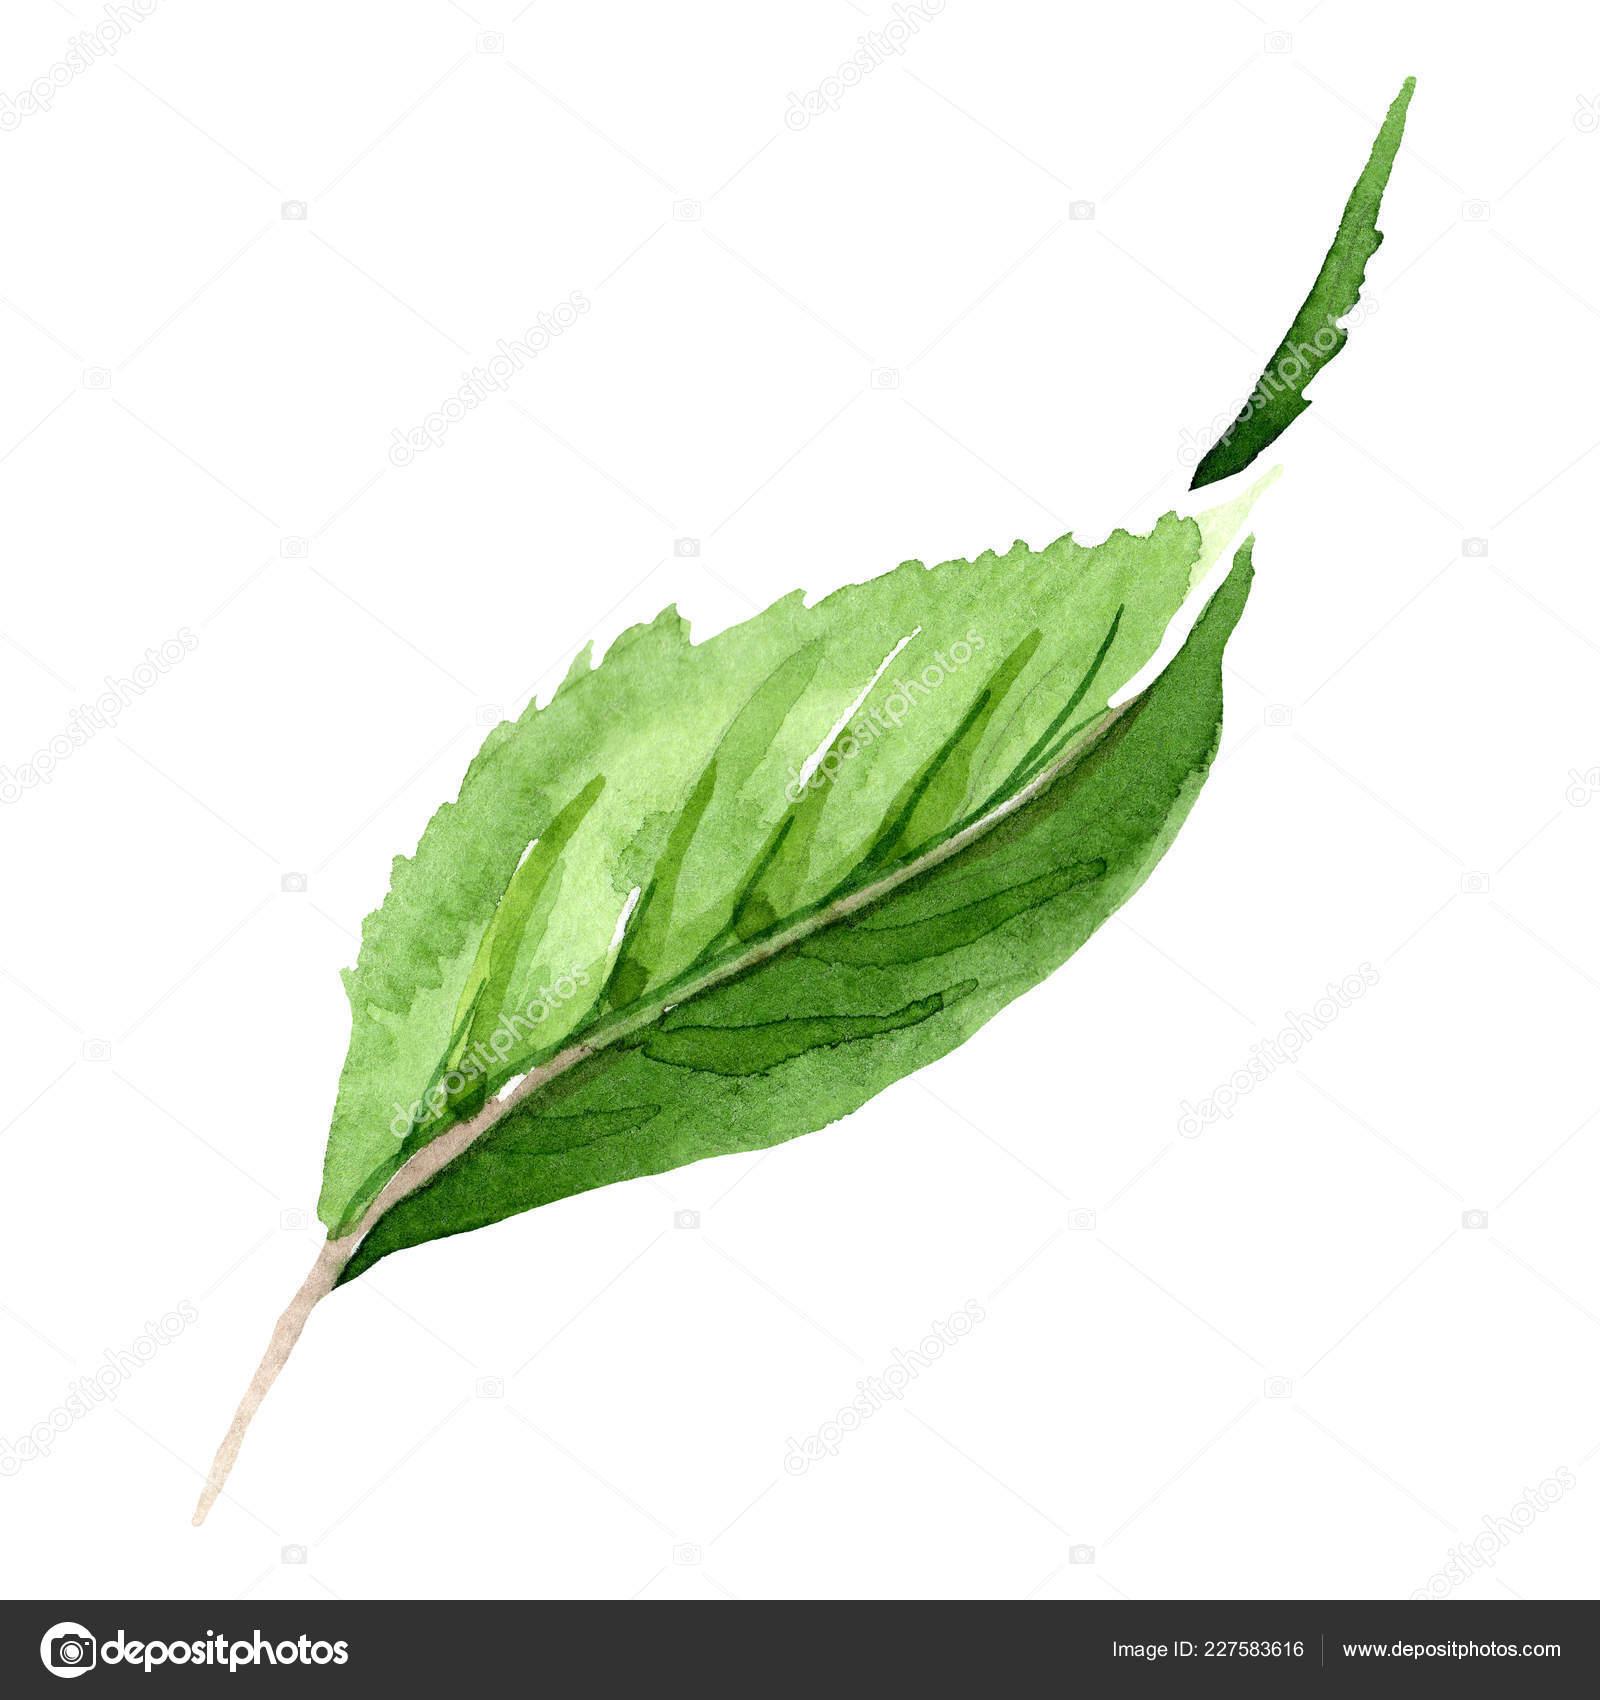 Green Tea Leaves Watercolor Green Tea Leaves Isolated Illustration Element Watercolor Background Illustration Set Stock Photo C Mystocks 227583616